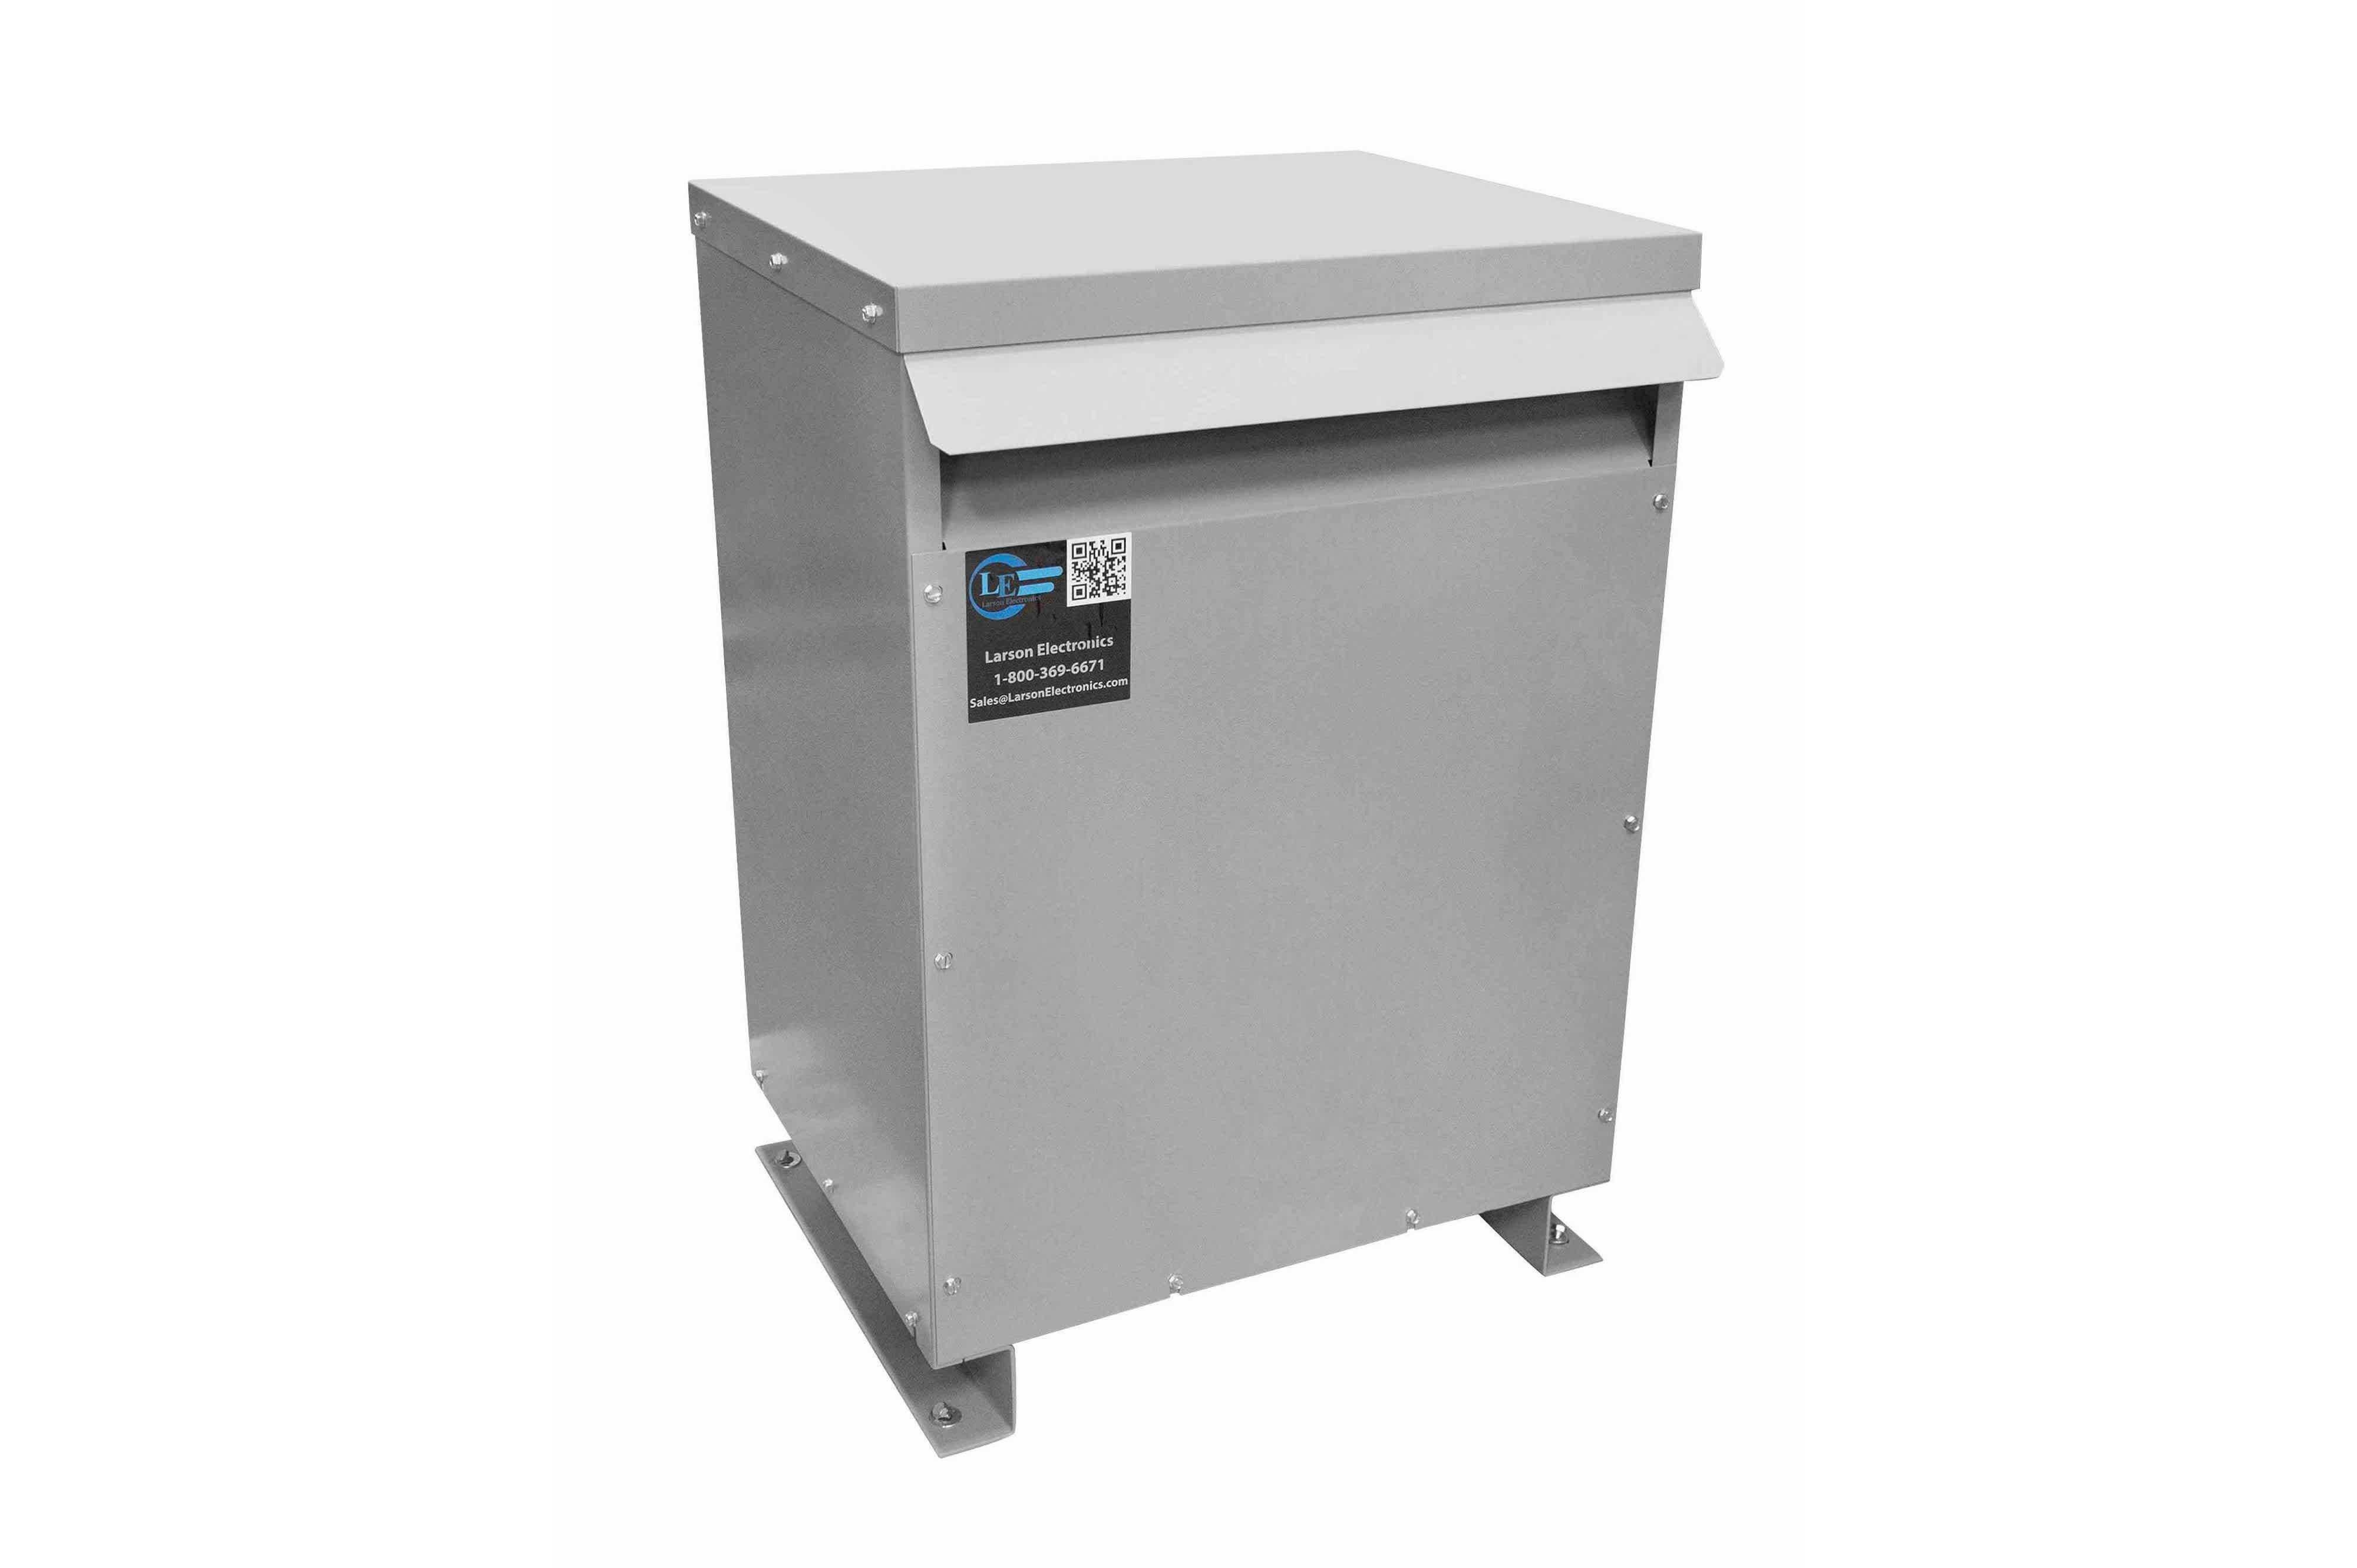 32.5 kVA 3PH Isolation Transformer, 240V Wye Primary, 480V Delta Secondary, N3R, Ventilated, 60 Hz